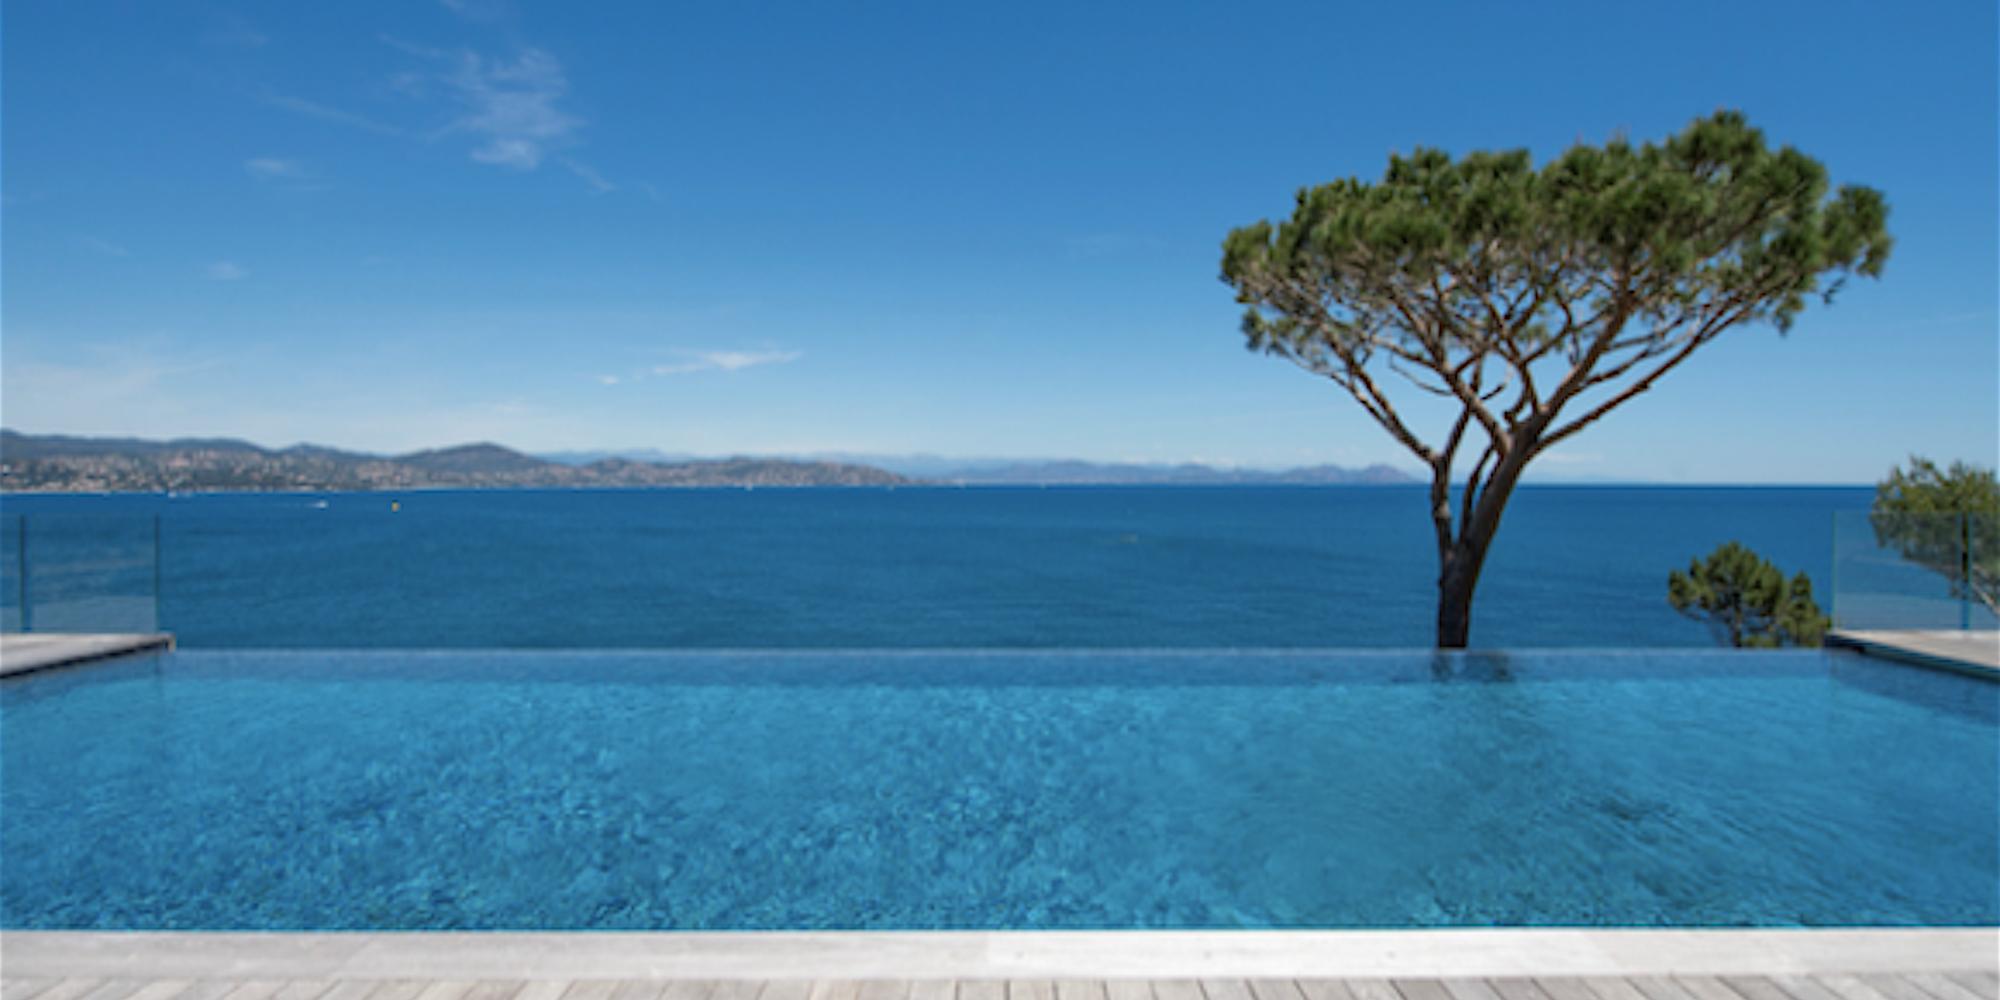 Villa Kintaparc St Tropez France Excellence Luxury Villas